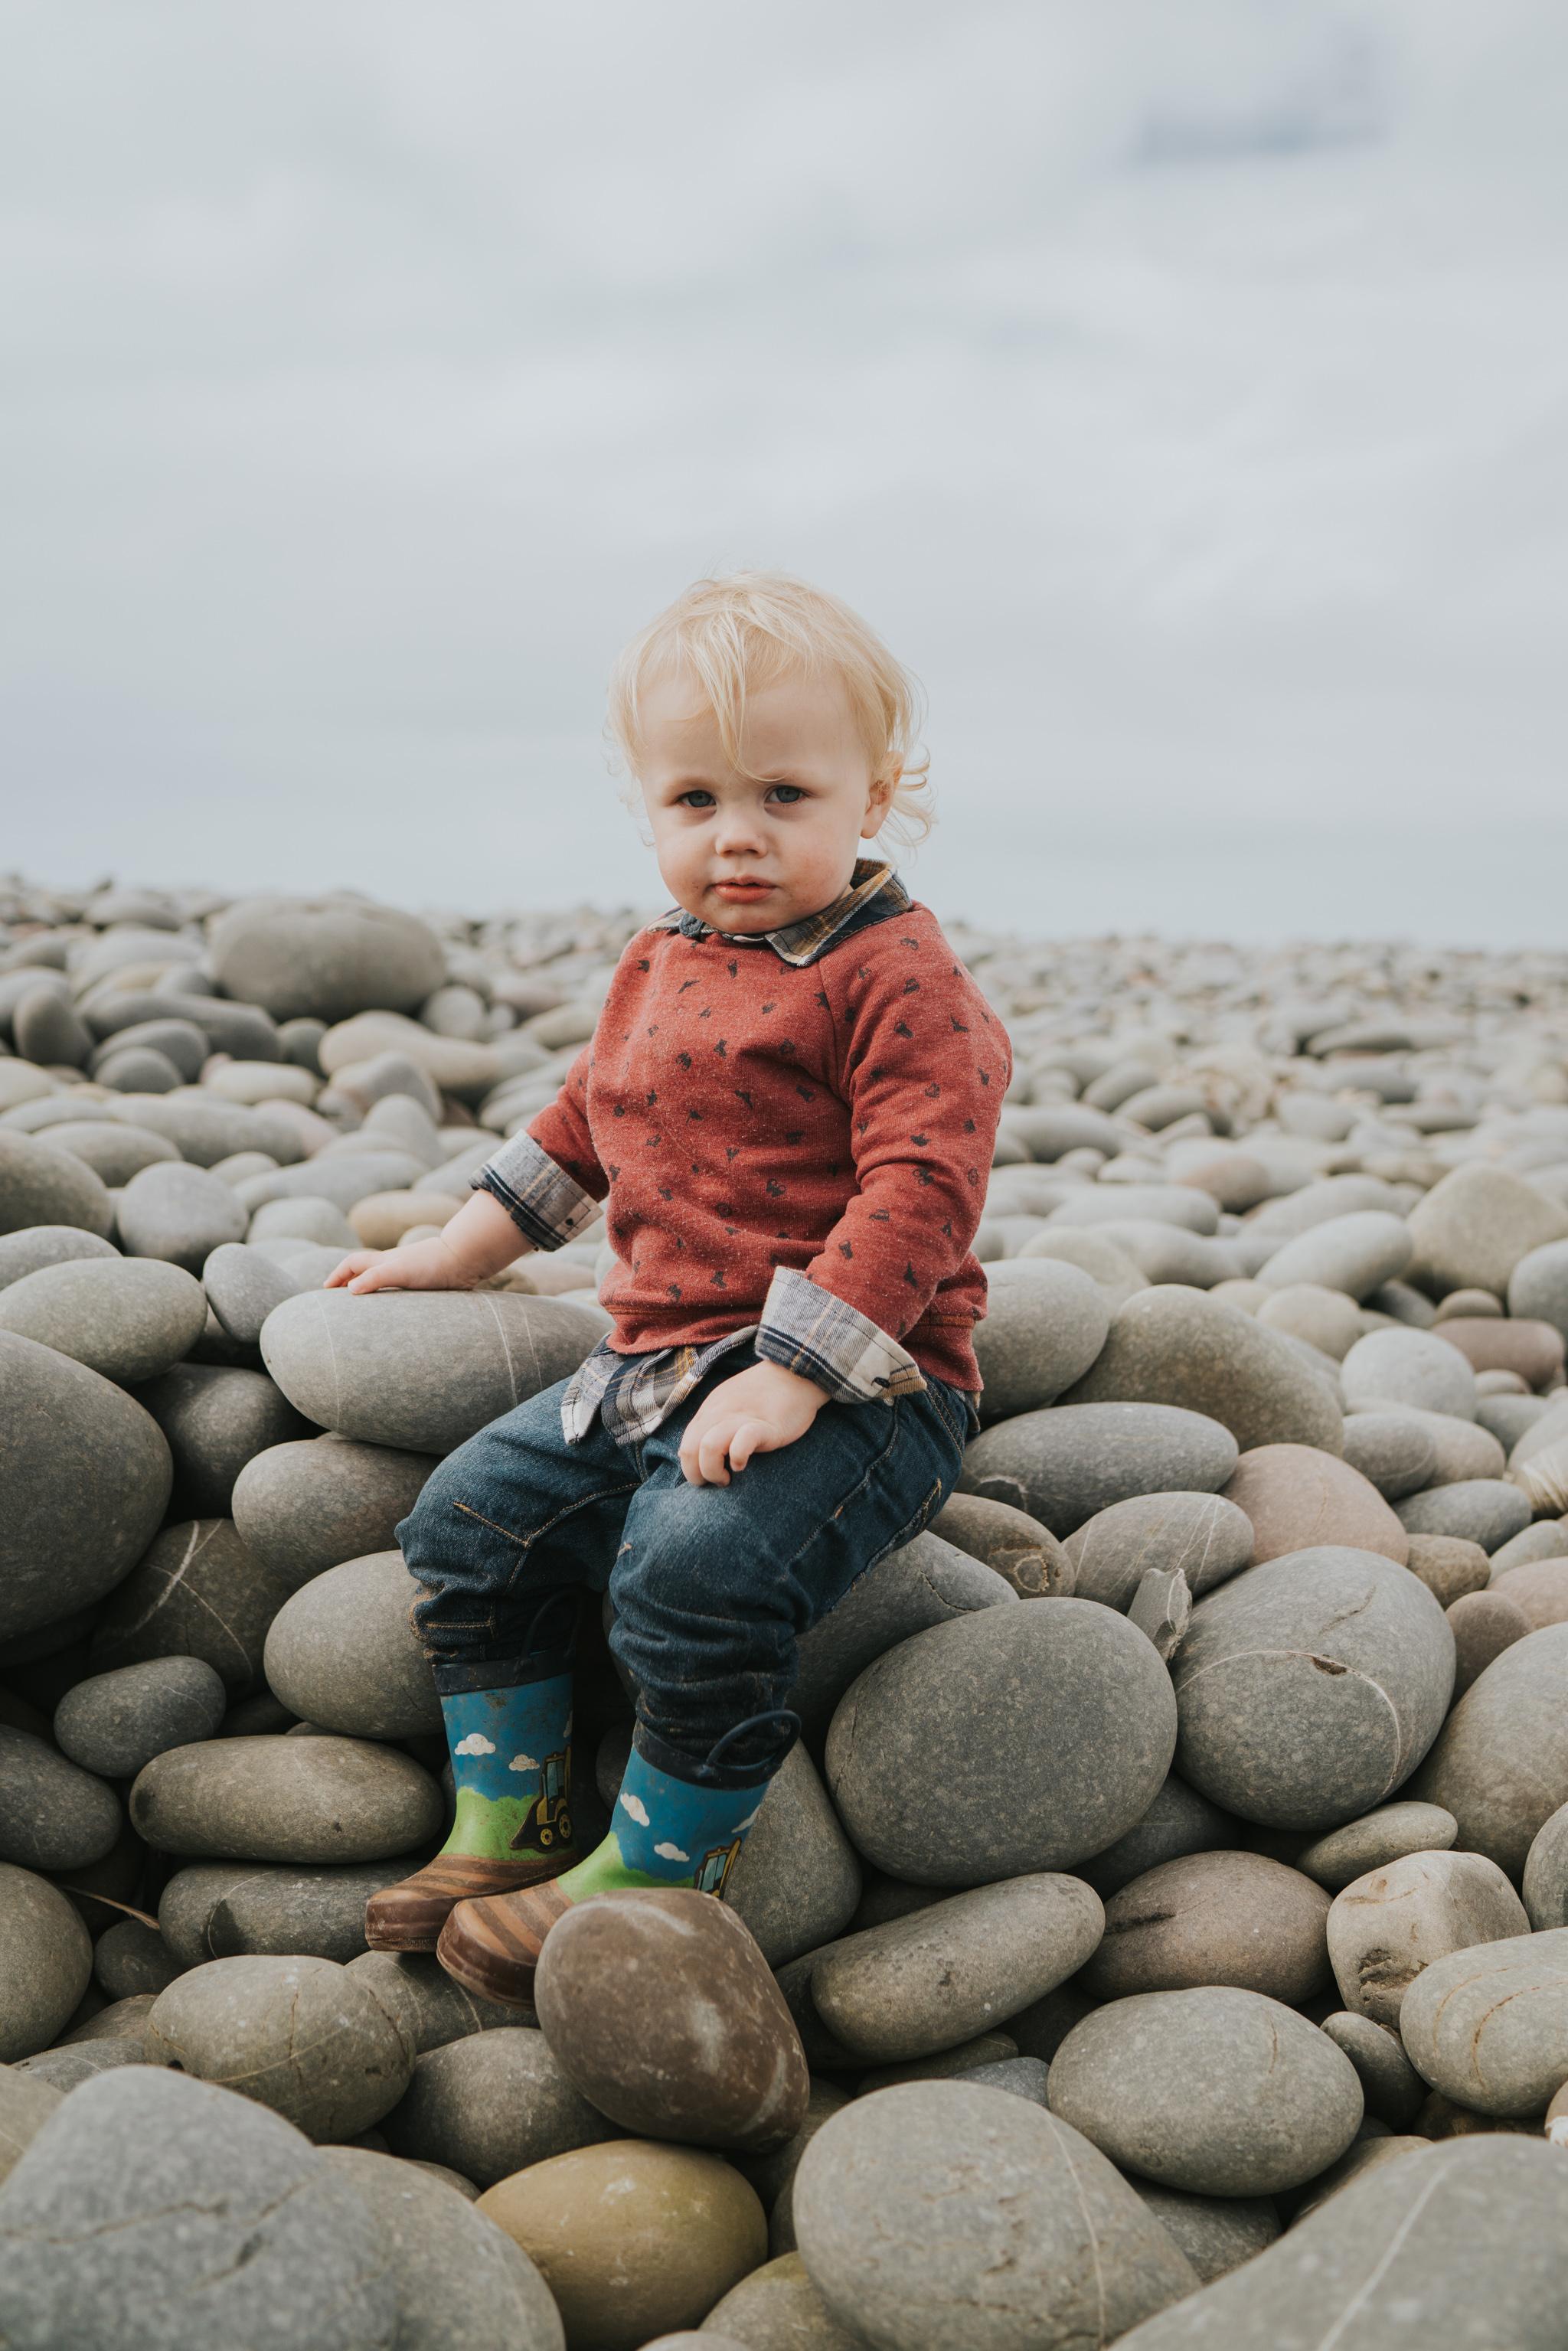 beach-family-session-westward-ho-north-devon-grace-elizabeth-devon-family-wedding-photographer-essex-devon-norfolk (38 of 43).jpg